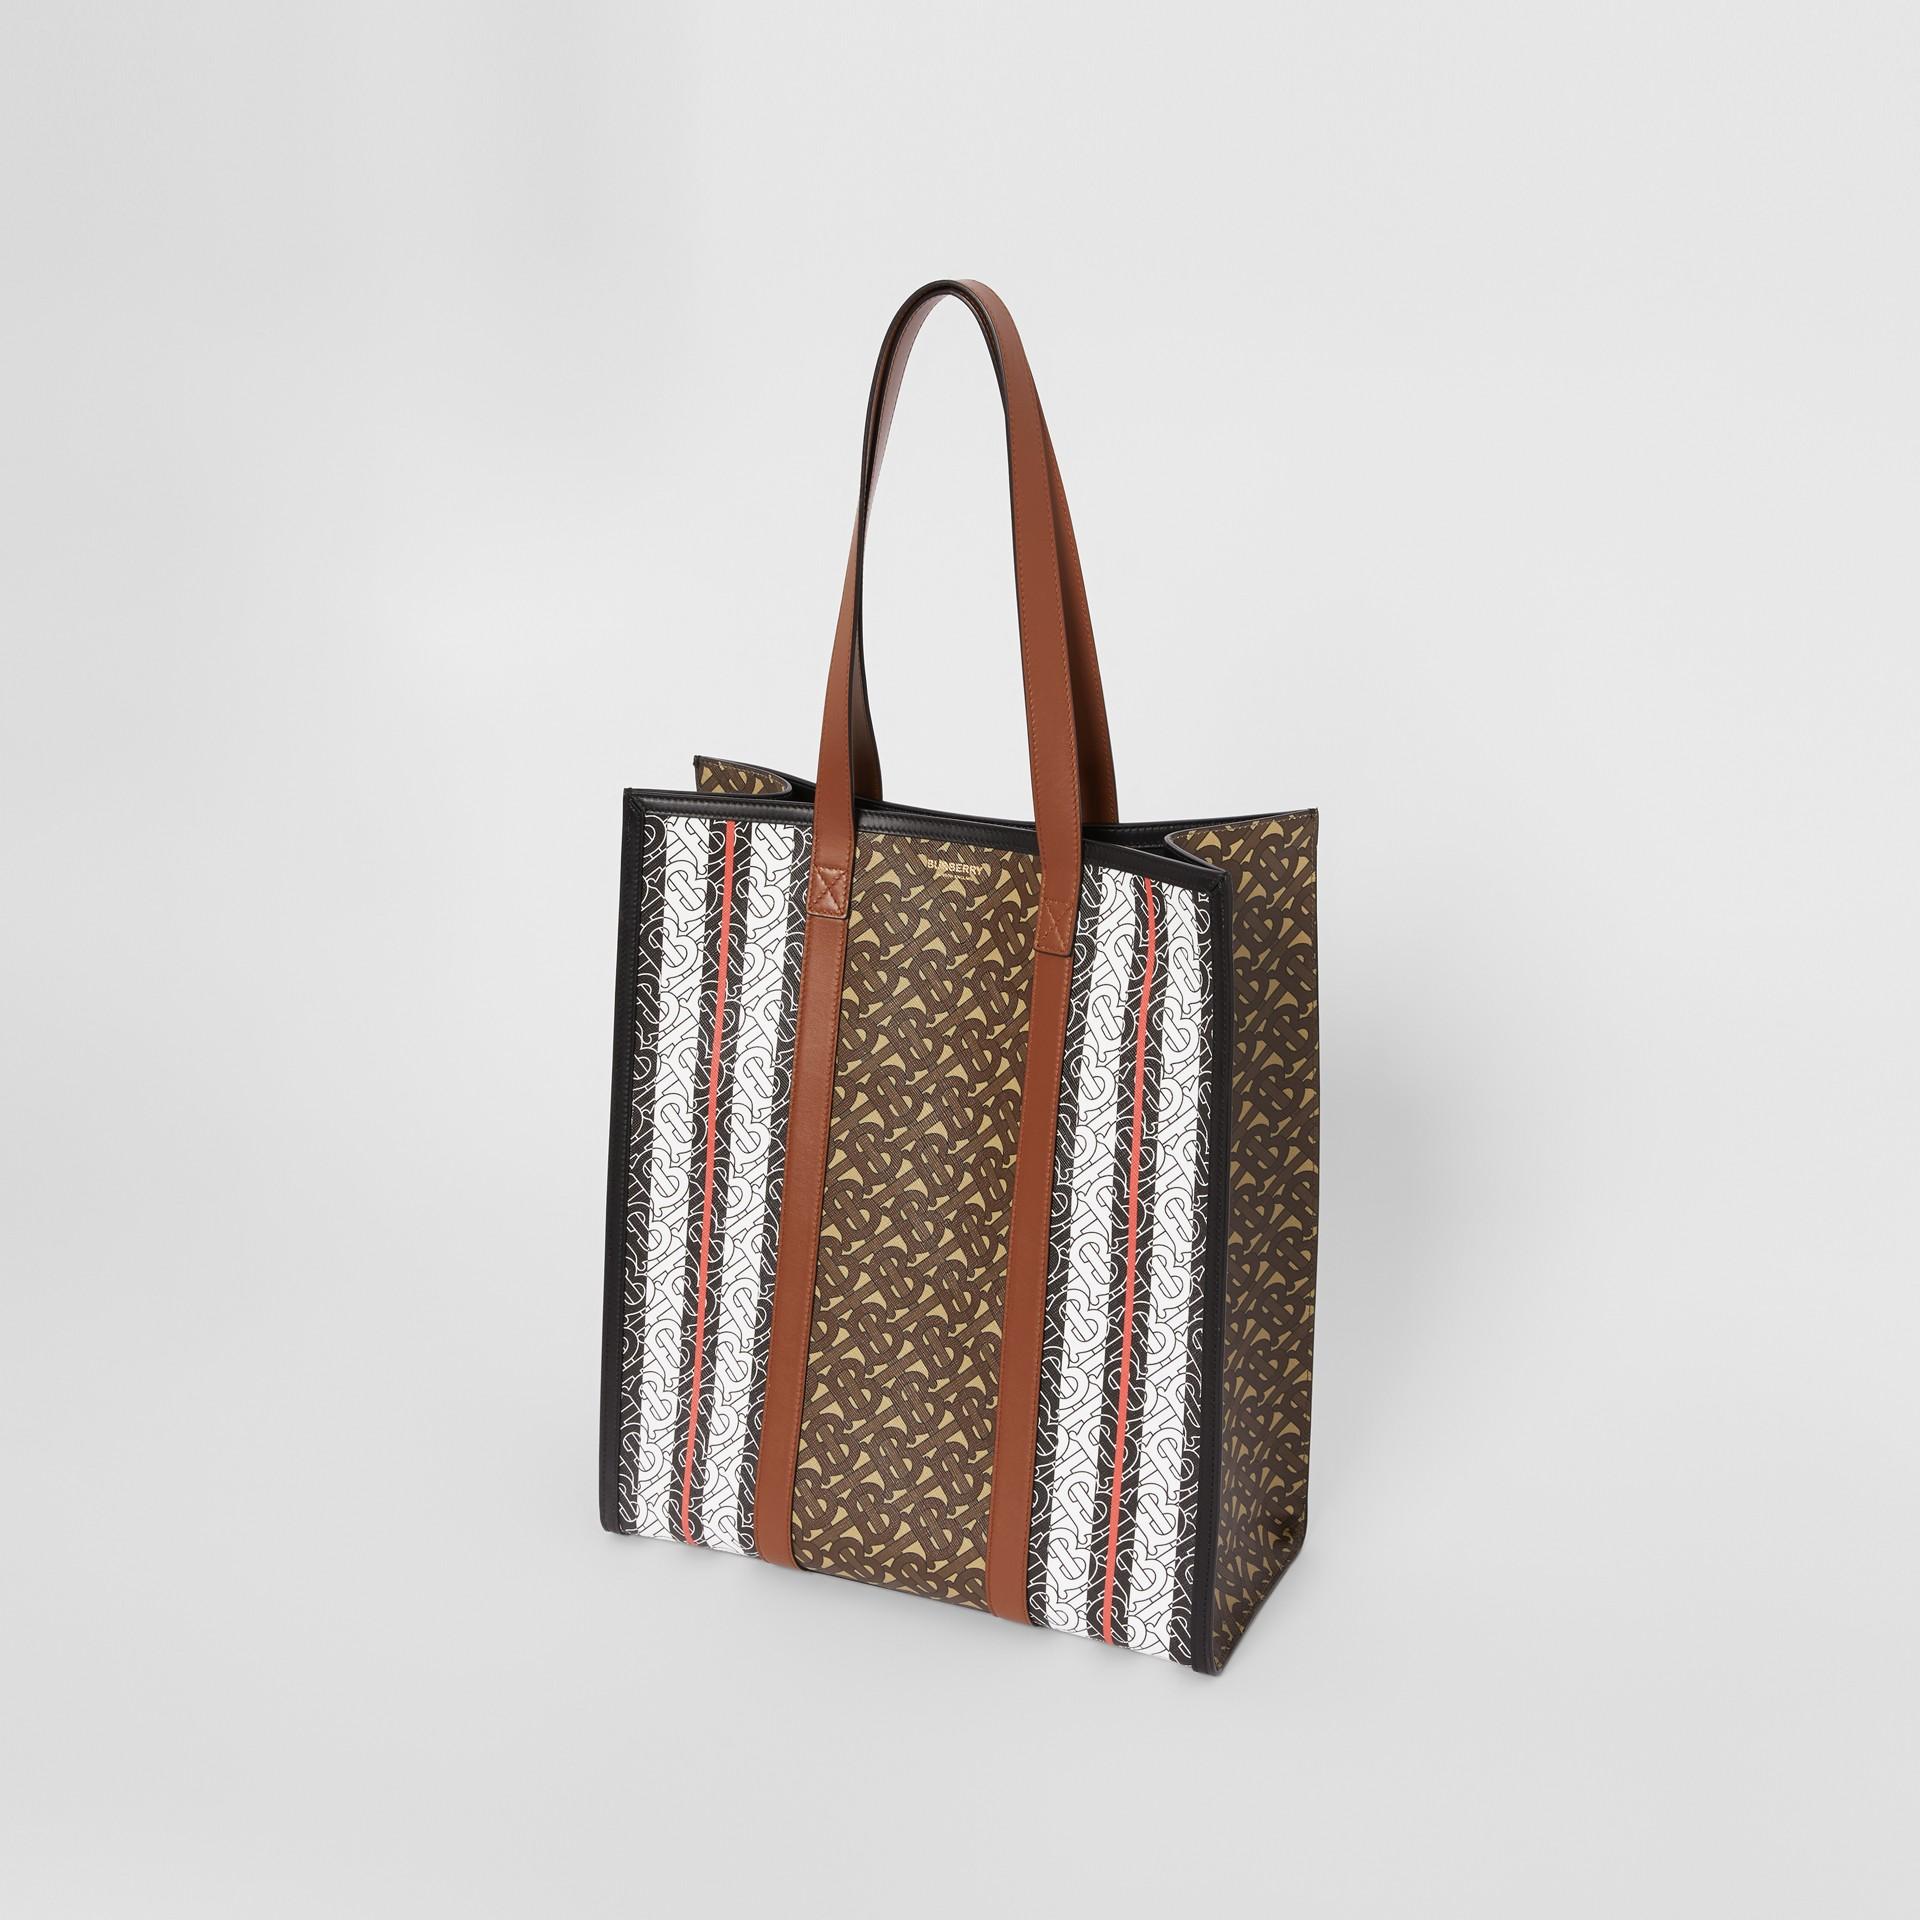 Monogram Stripe E-canvas Portrait Tote Bag in Bridle Brown - Women | Burberry United States - gallery image 4